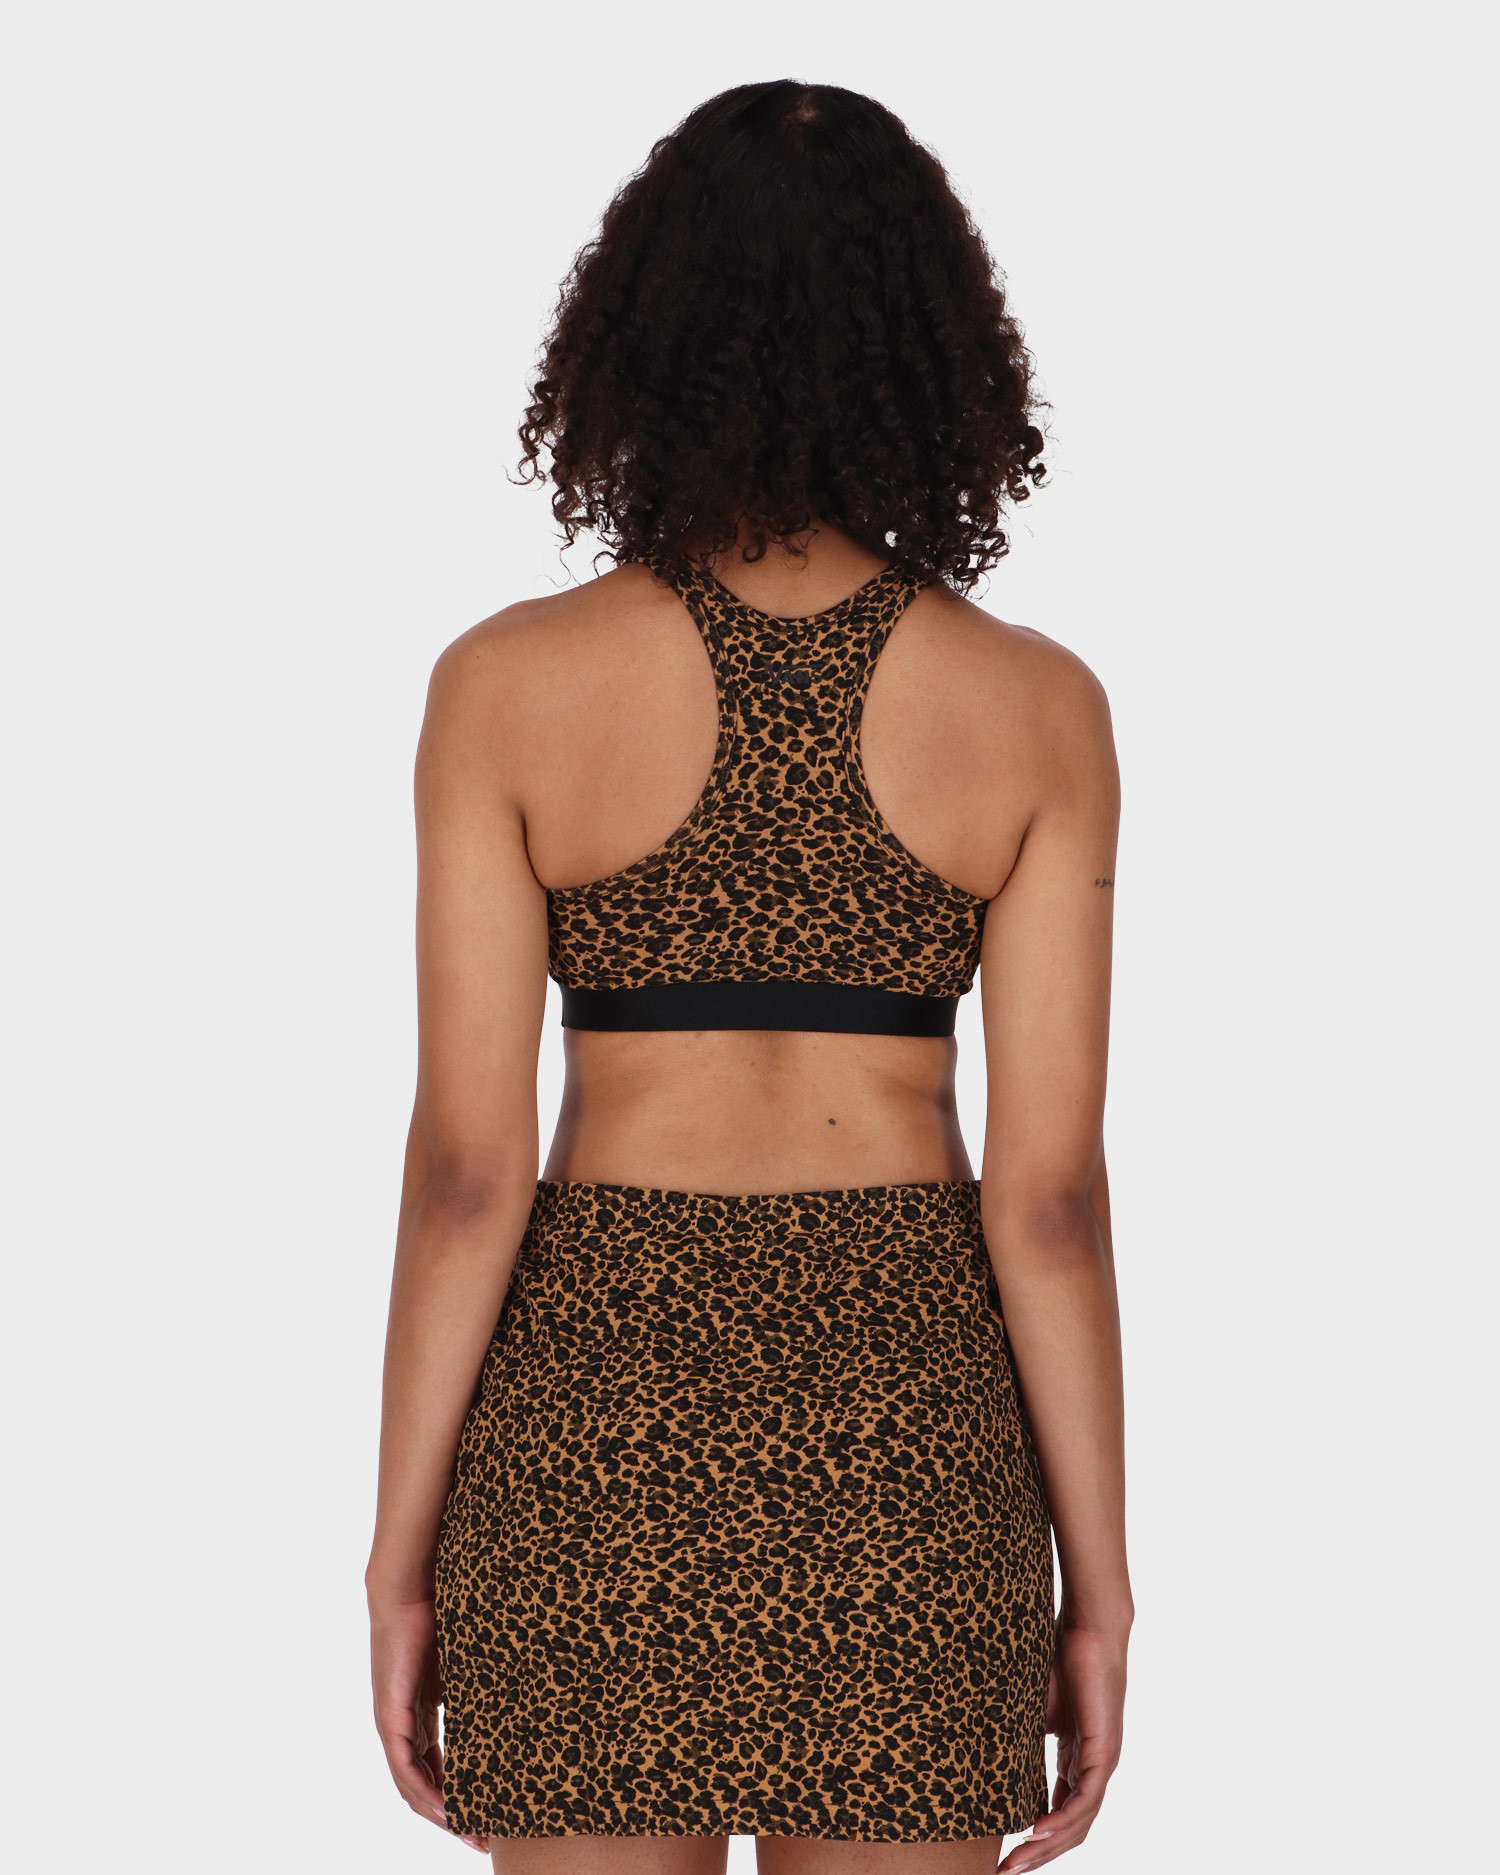 Vans Strauberry Leopard Top Cher Cheetah